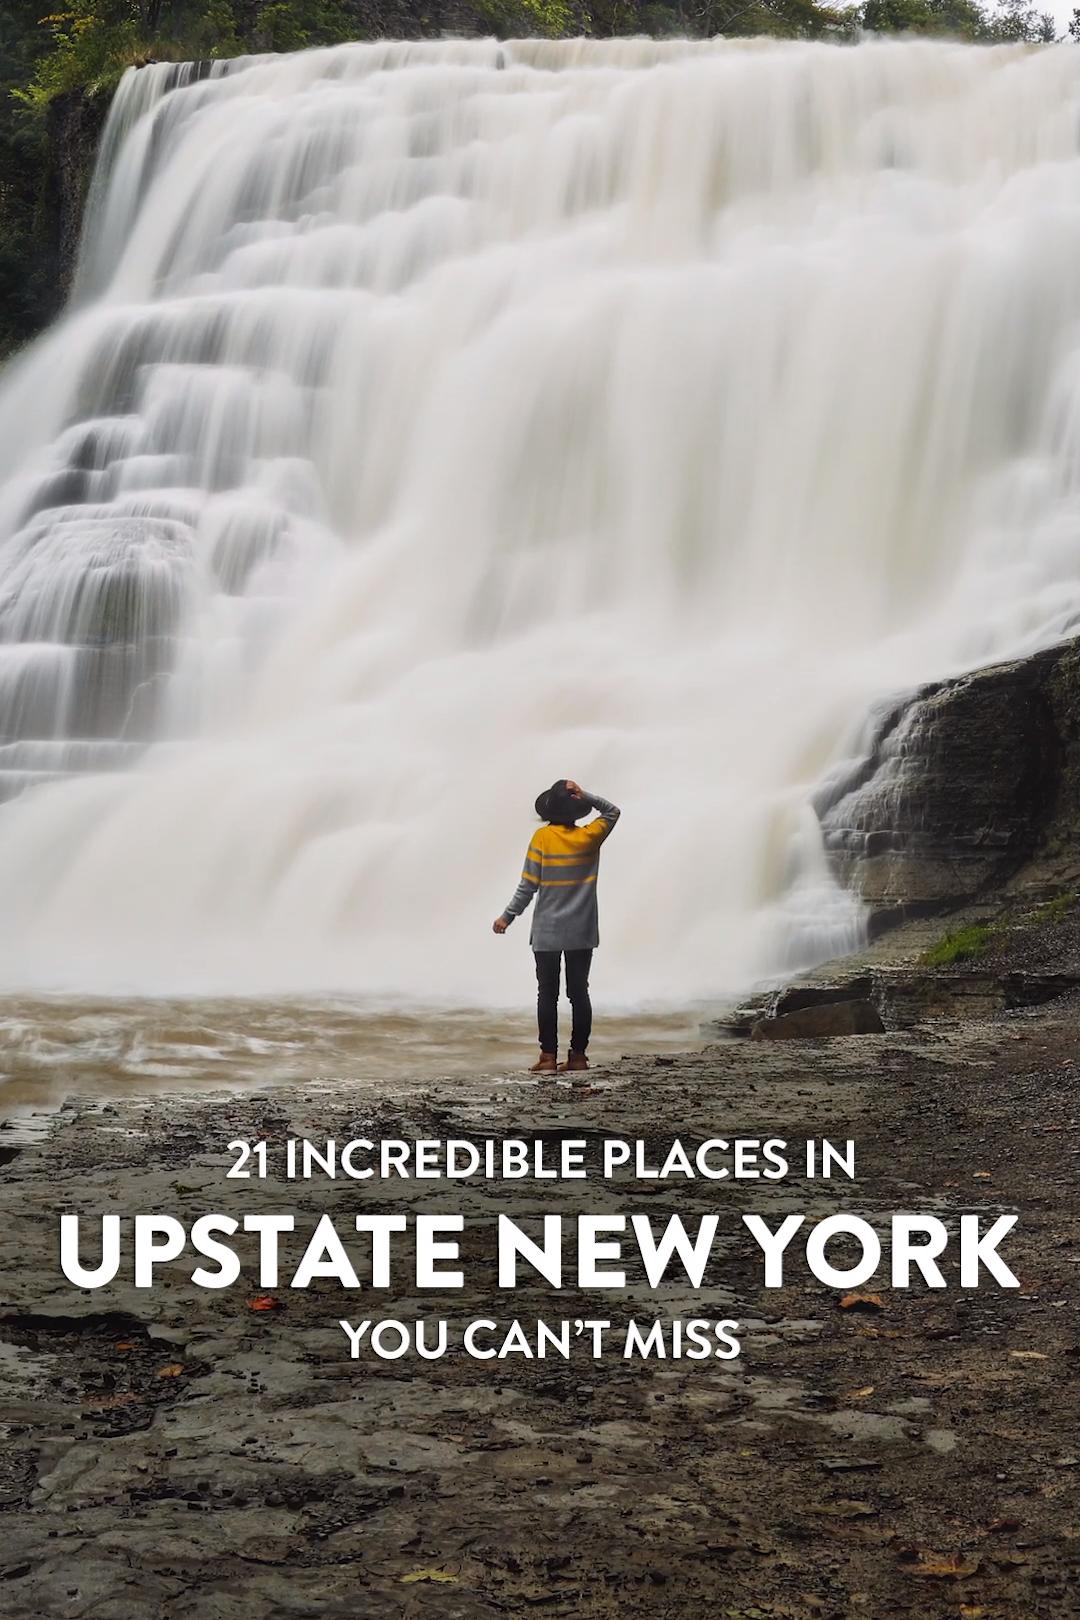 21 Best Places to Visit in Upstate NY // Local Adventurer #newyork #iloveny #ny #usa #visittheusa #roadtrip #localadventurer